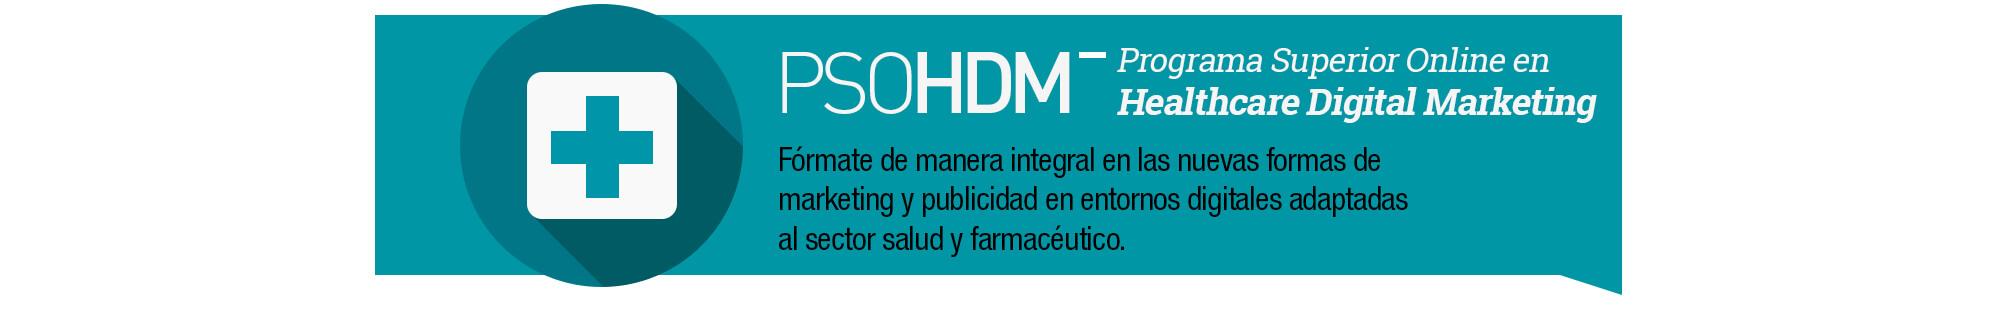 Programa Superior Online Healthcare Digital Marketing